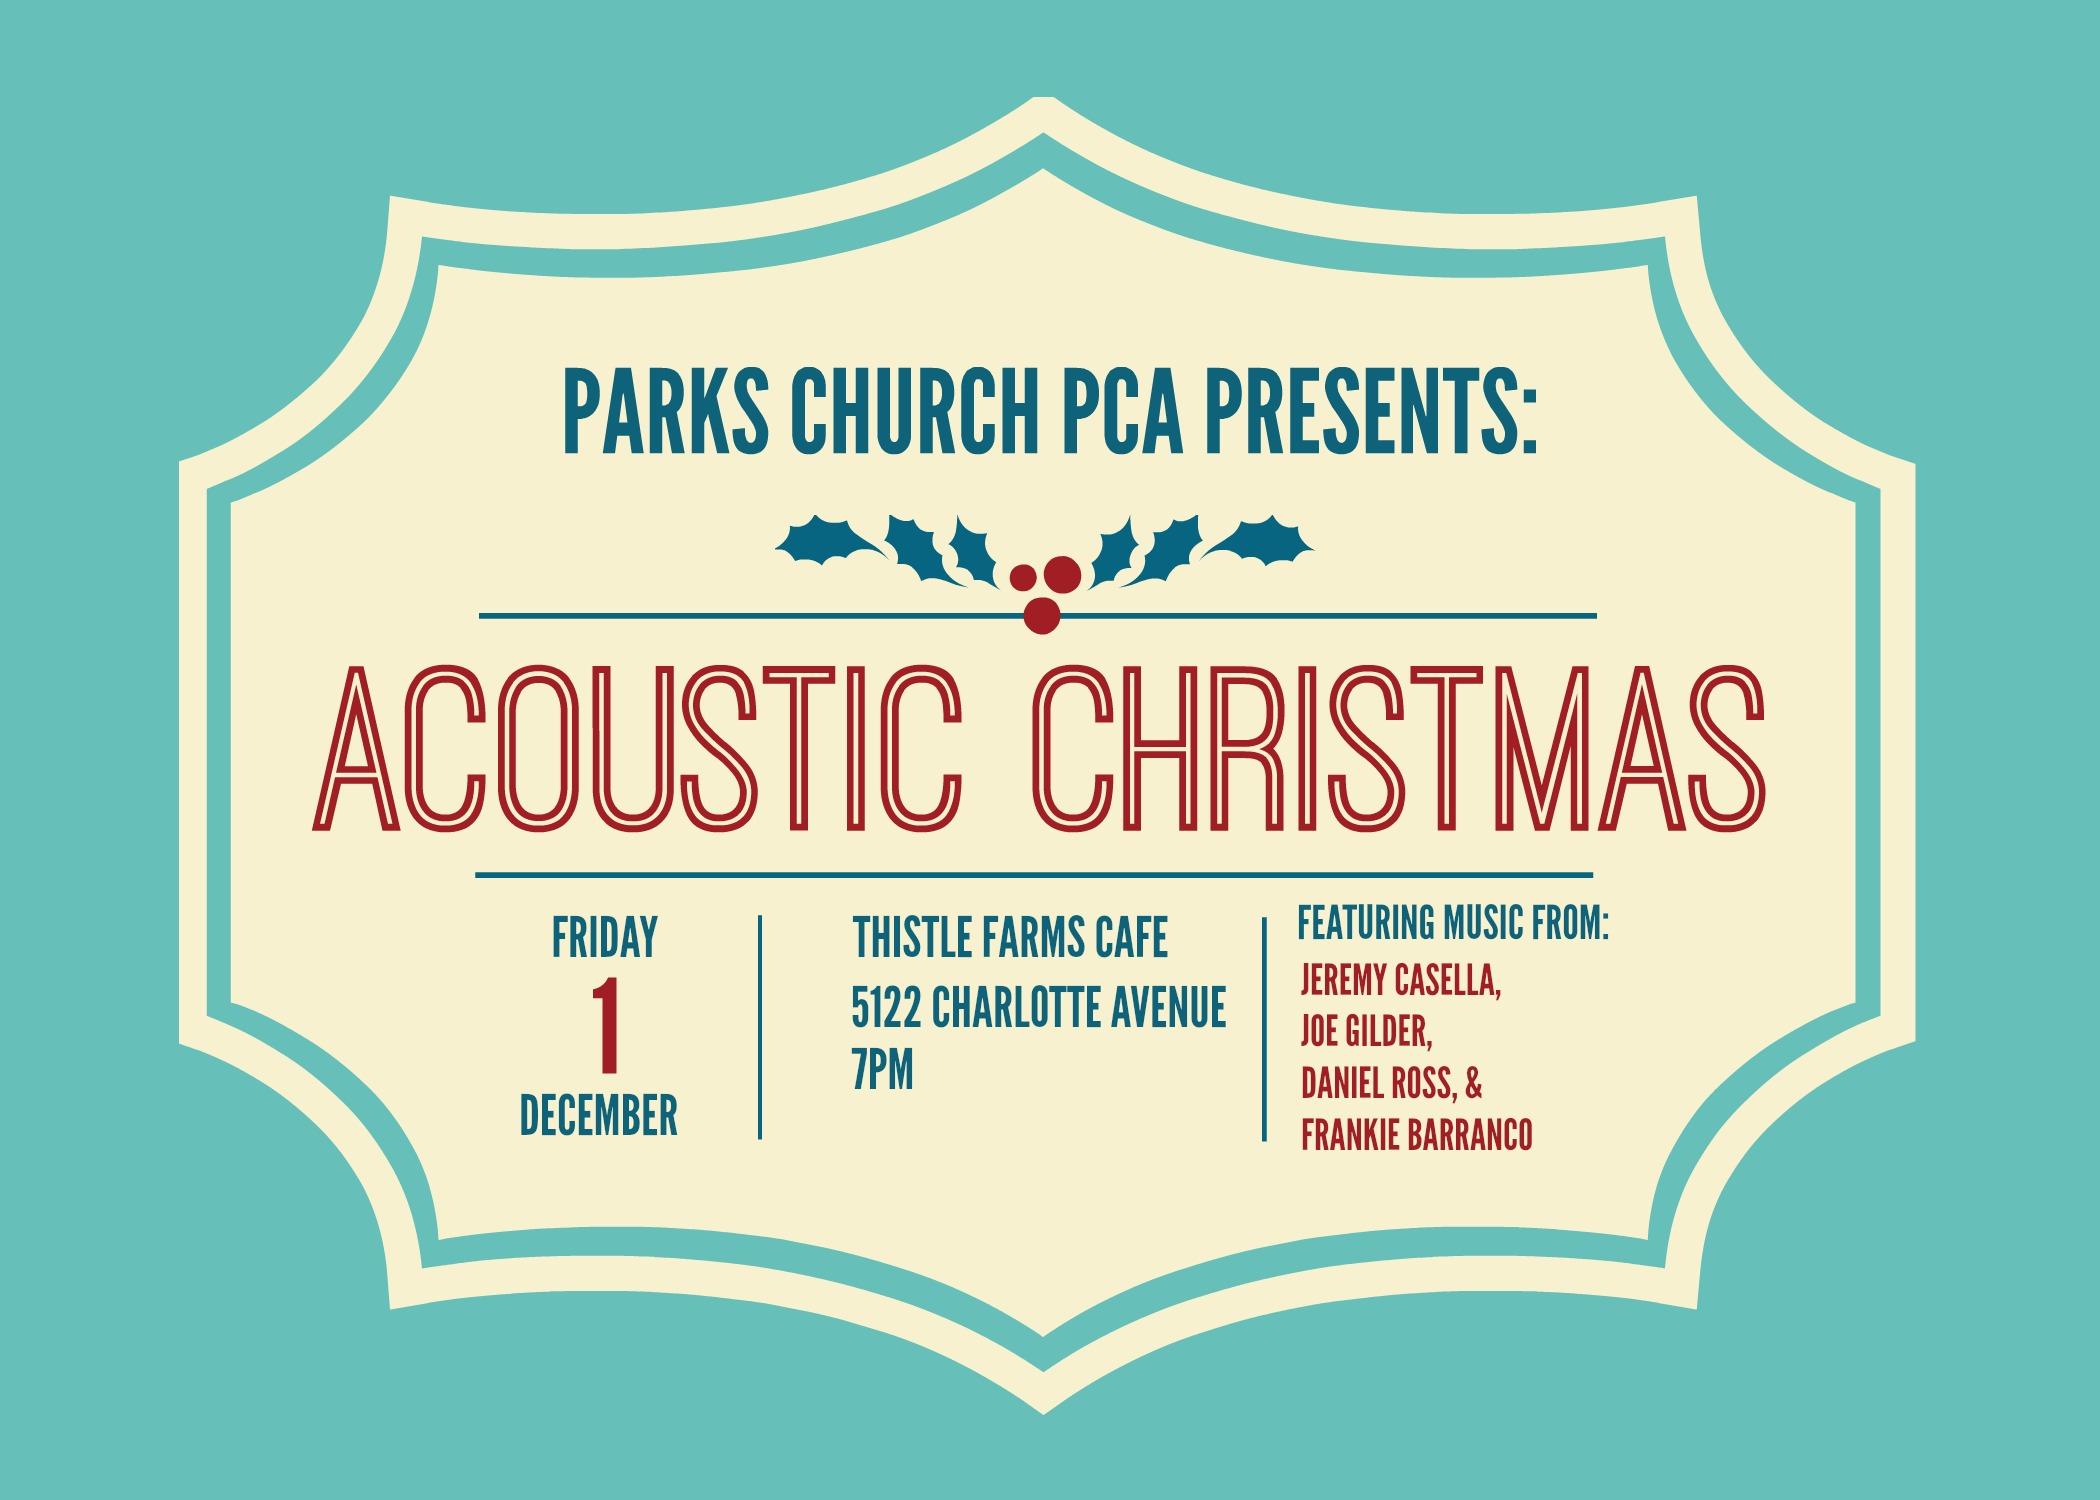 Acoustic Christmas FINAL (1) (1).jpg